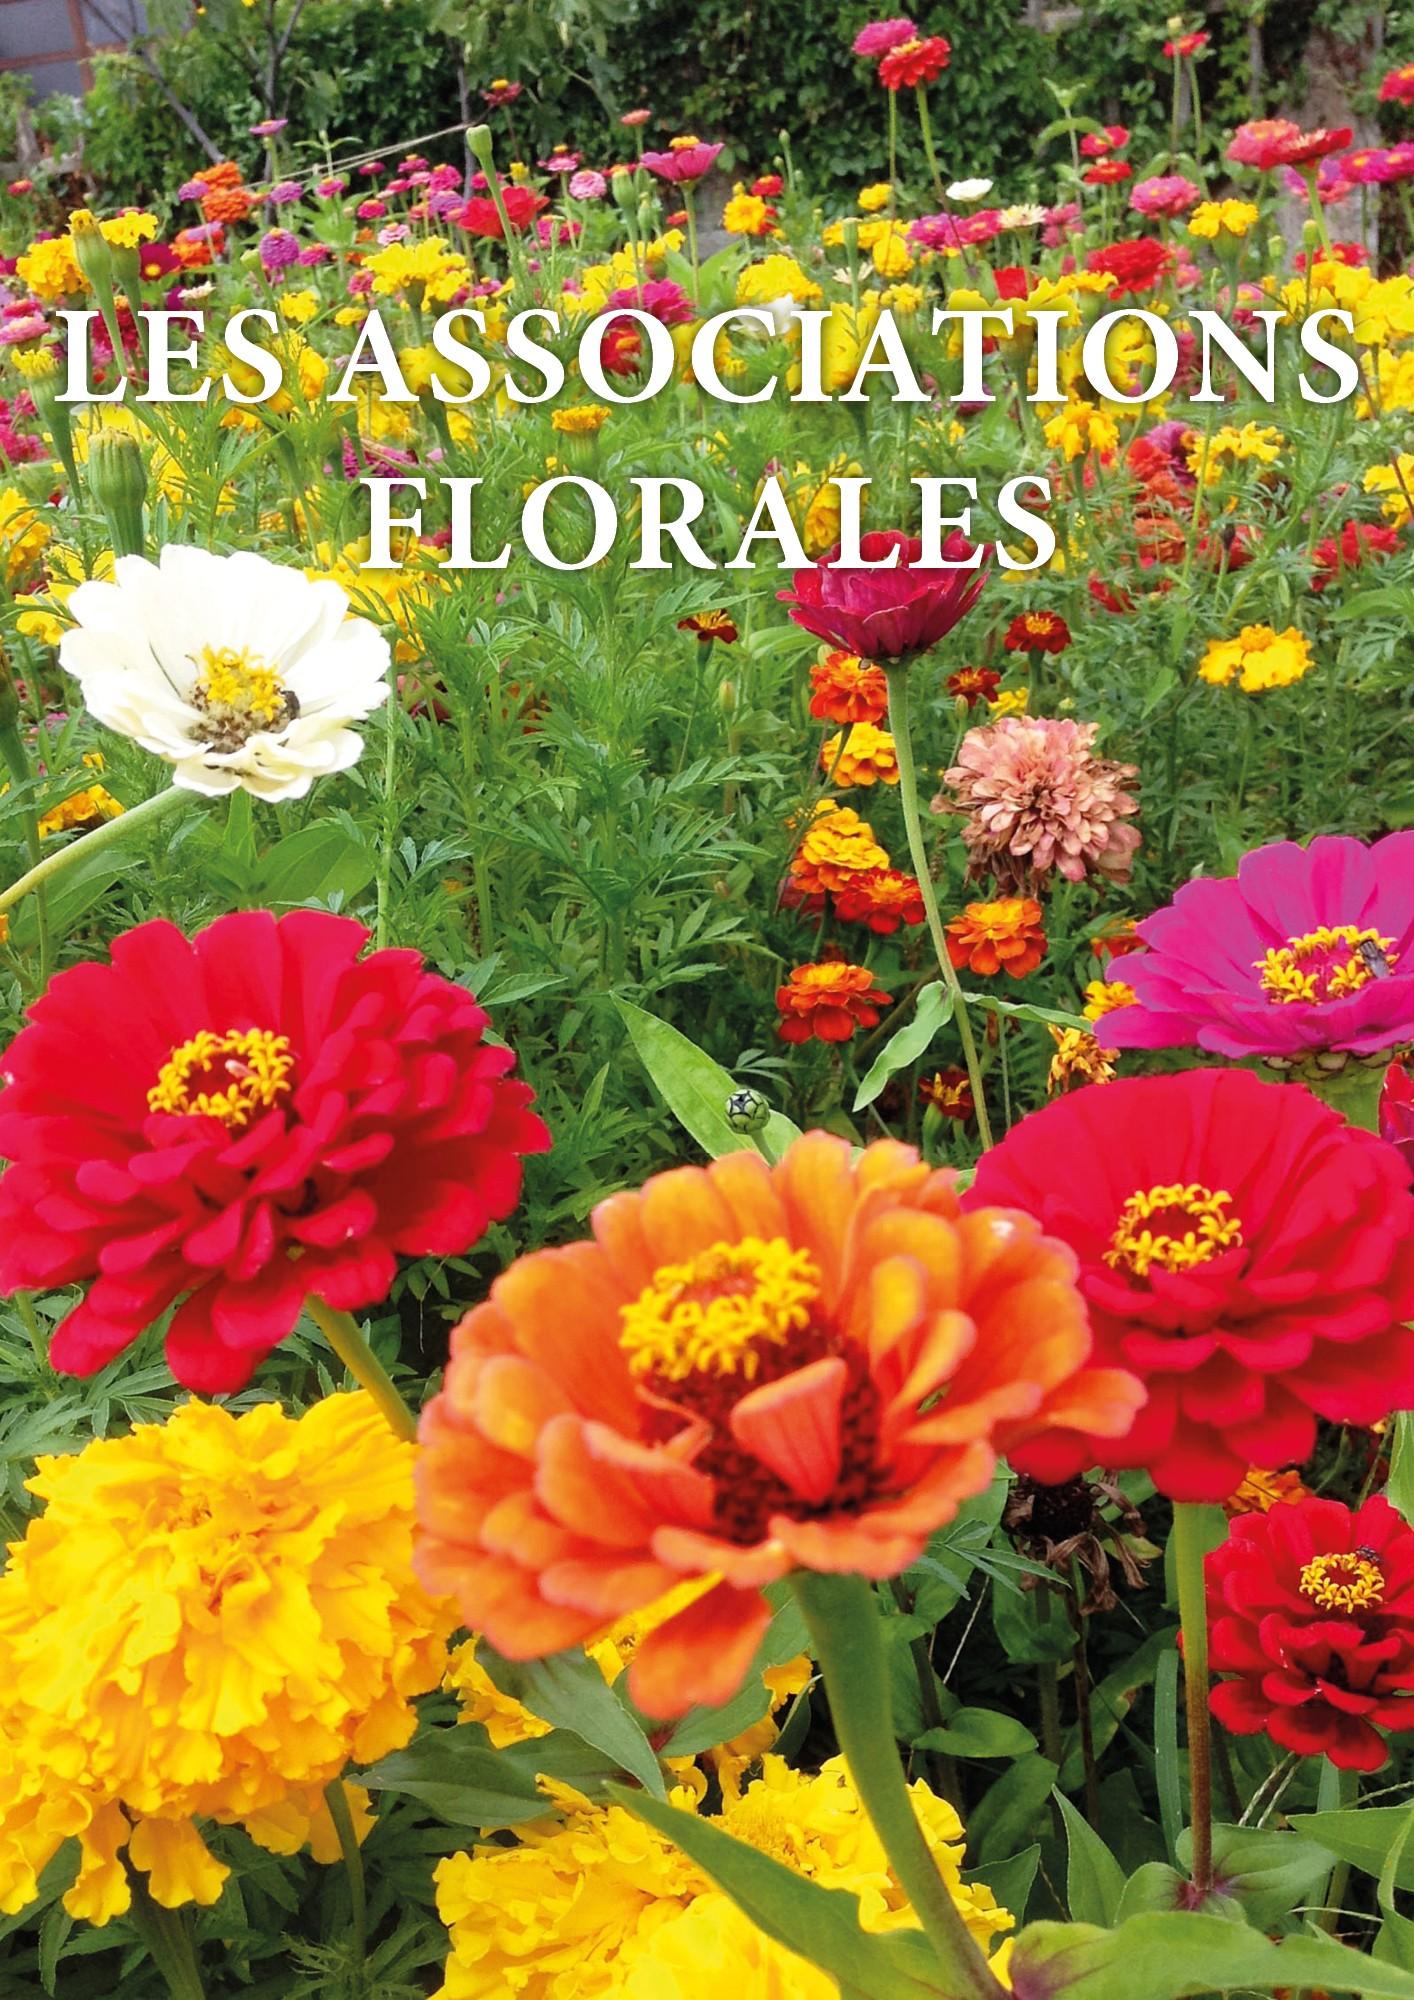 Les associations florales